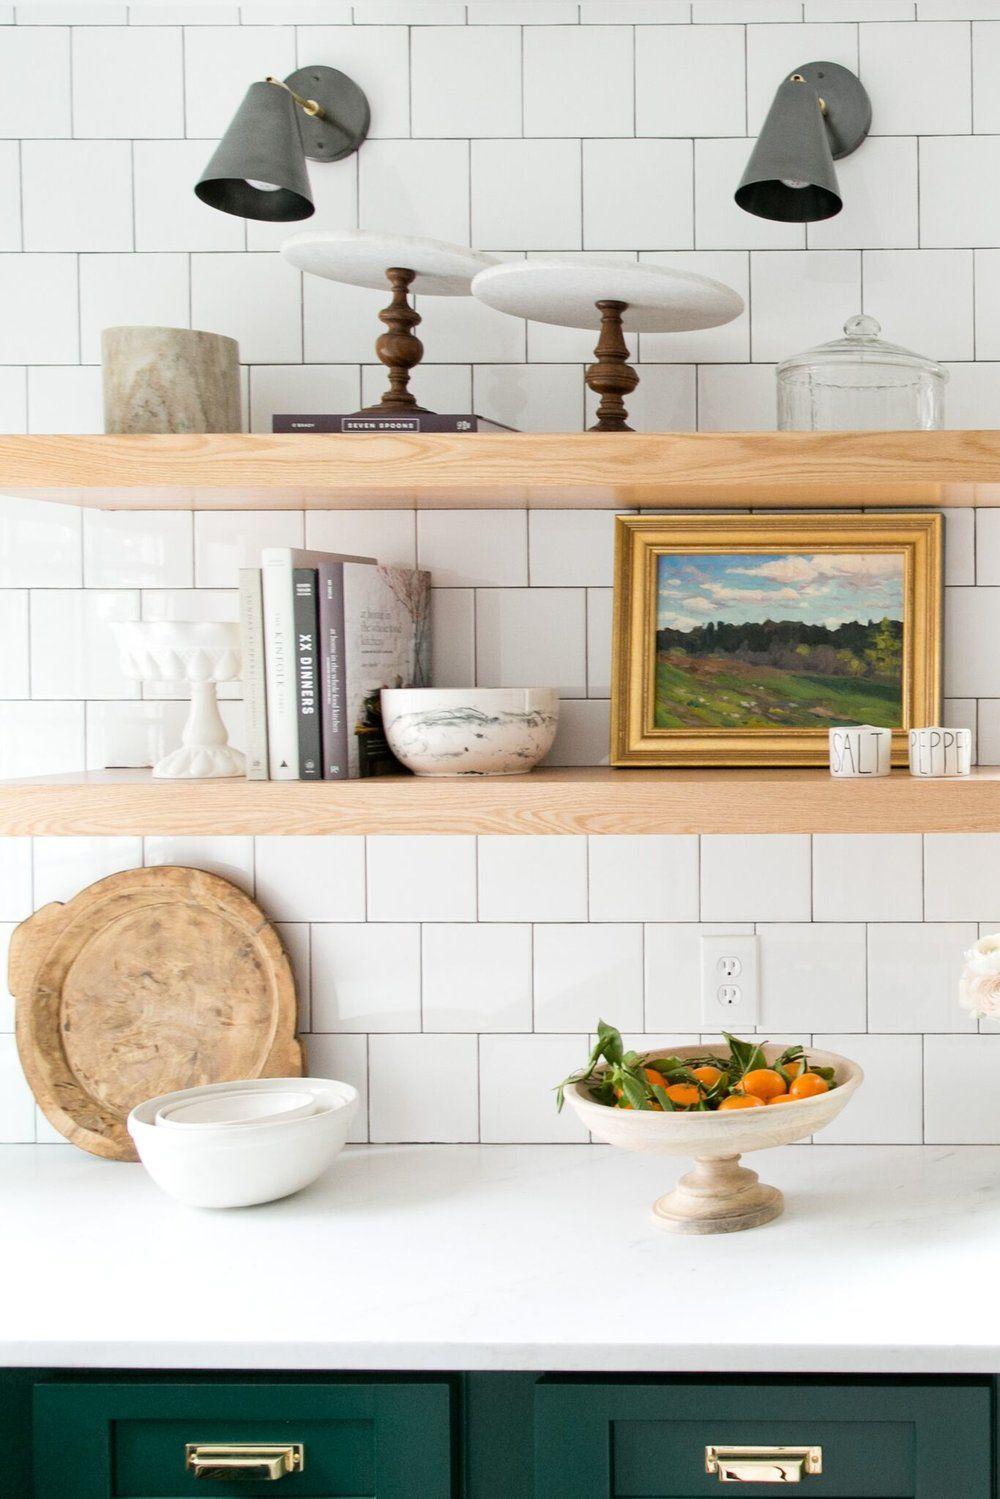 Denver Tudor | Open shelving, Studio mcgee and Tudor kitchen